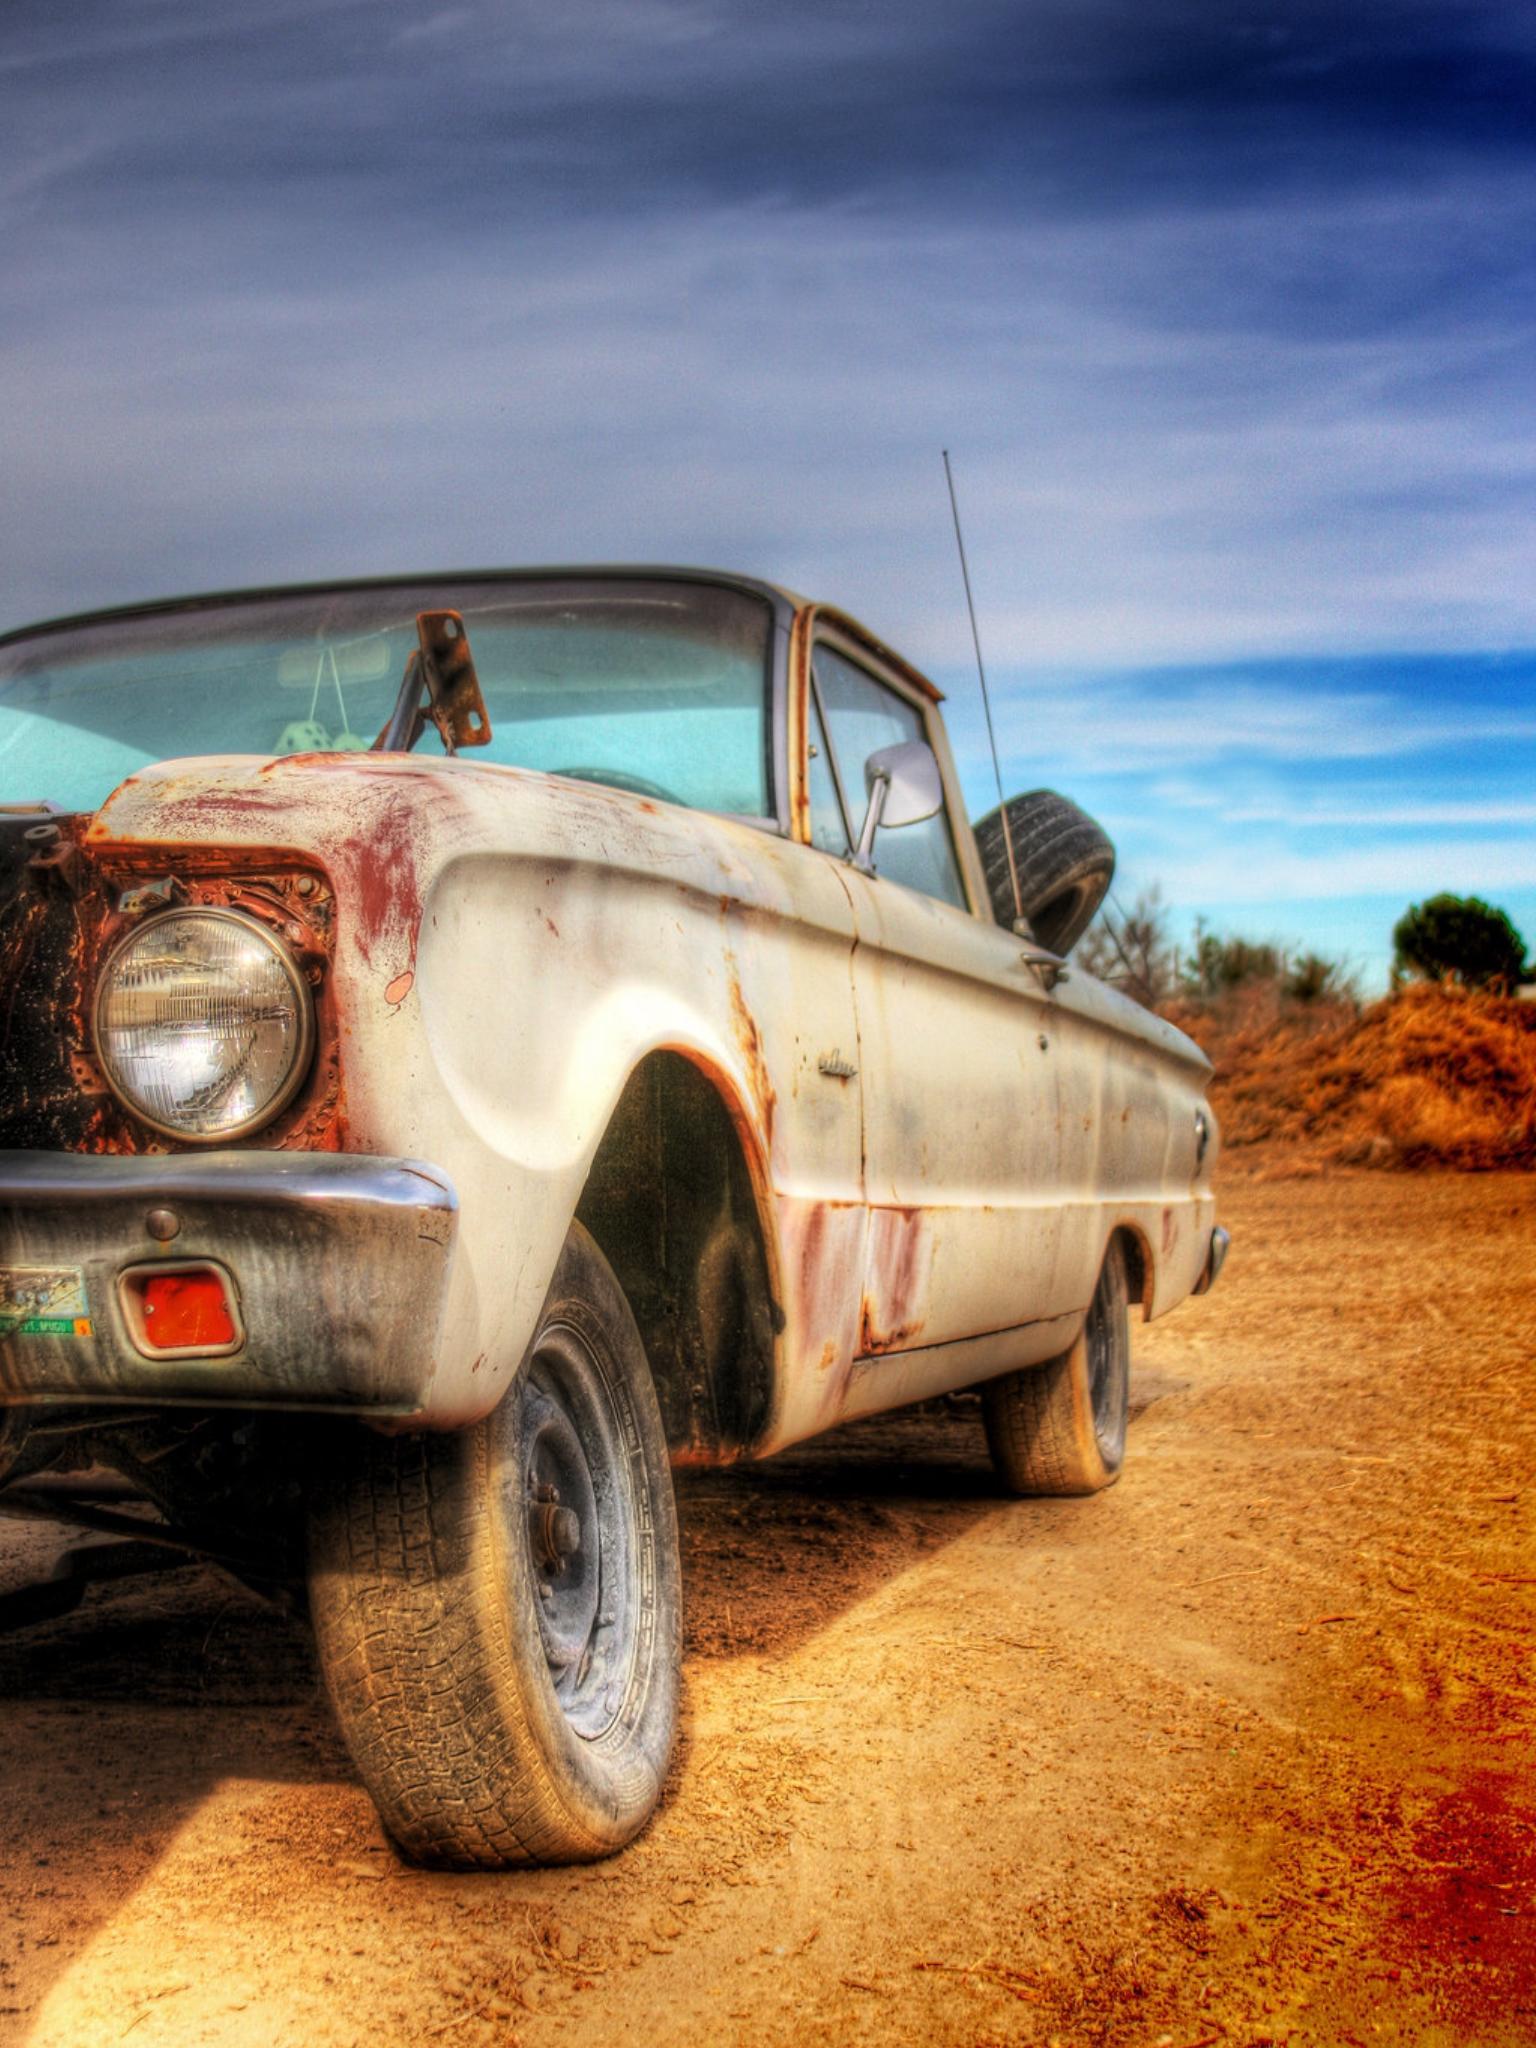 Ranchero 1. The old ranchero project car in my backyard. Source ...